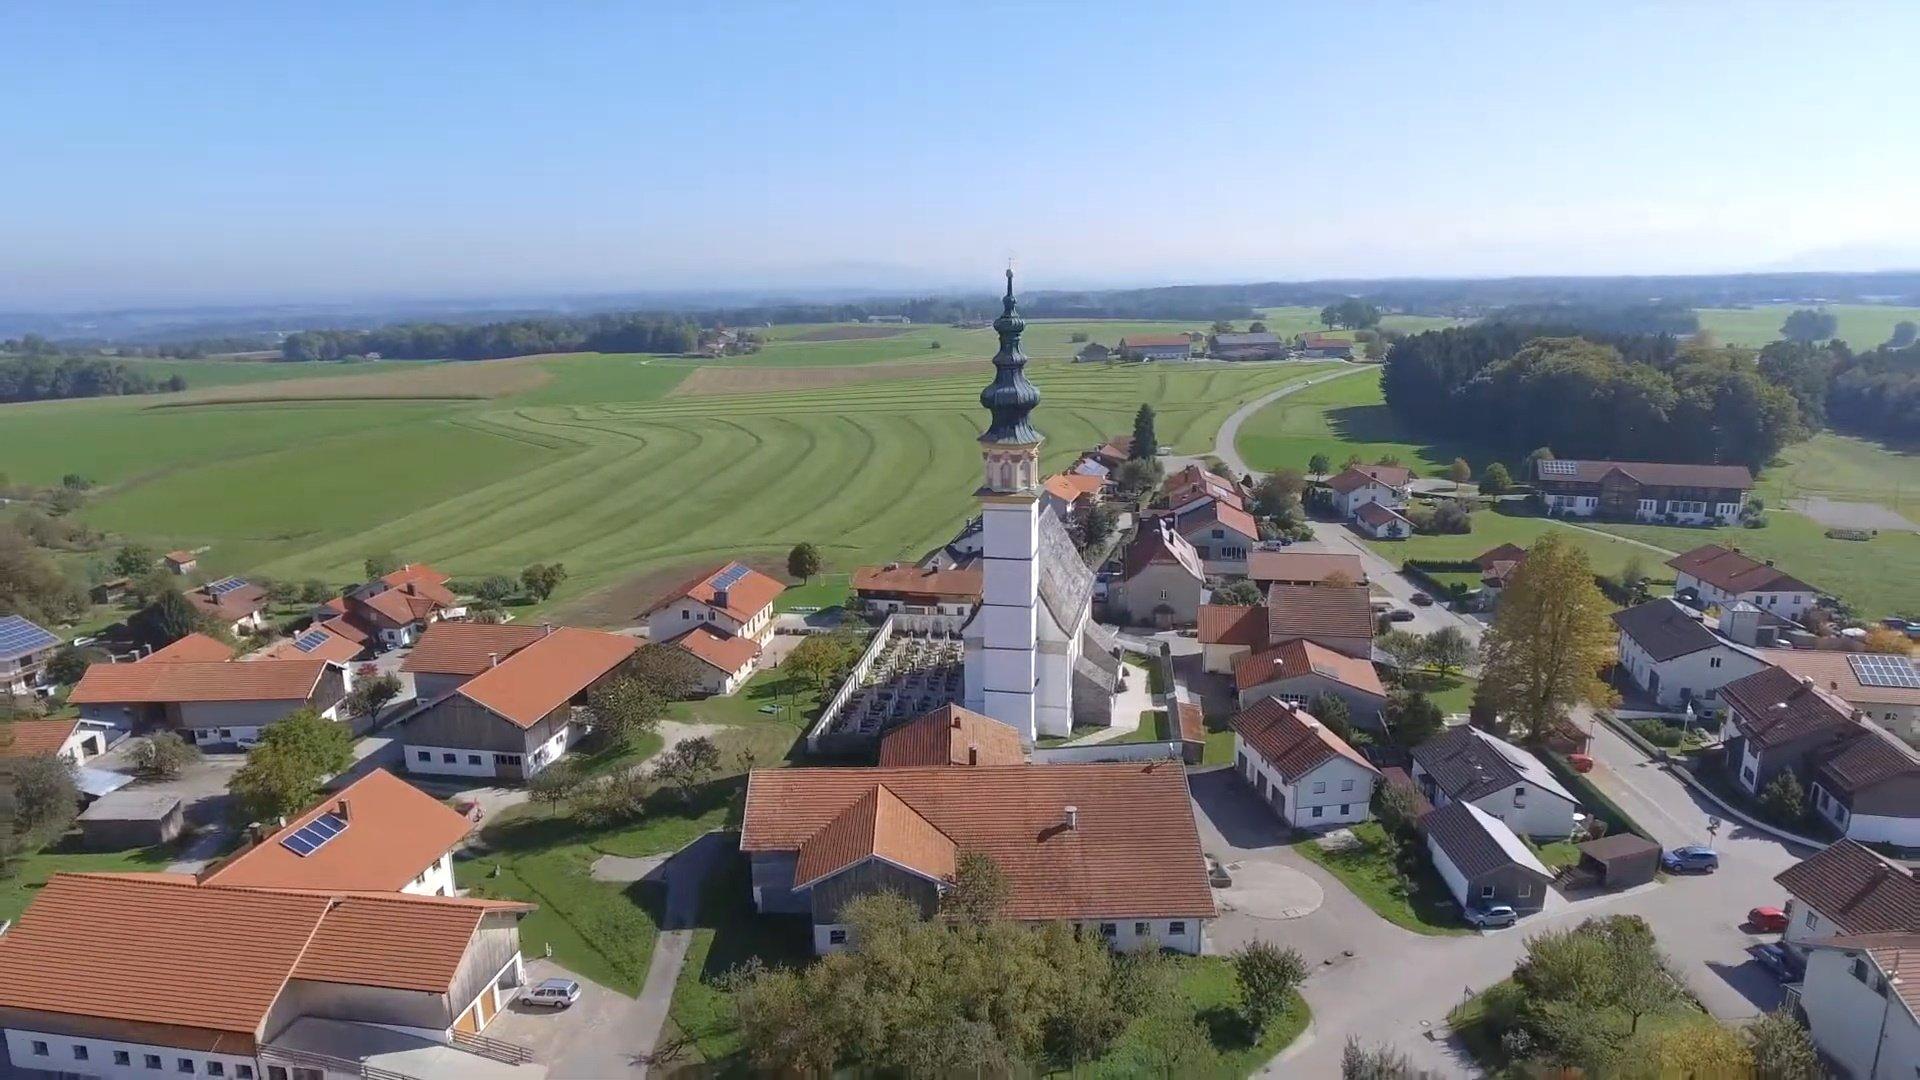 Wonneberg Chiemsee-Chiemgau Drohnenaufnahme